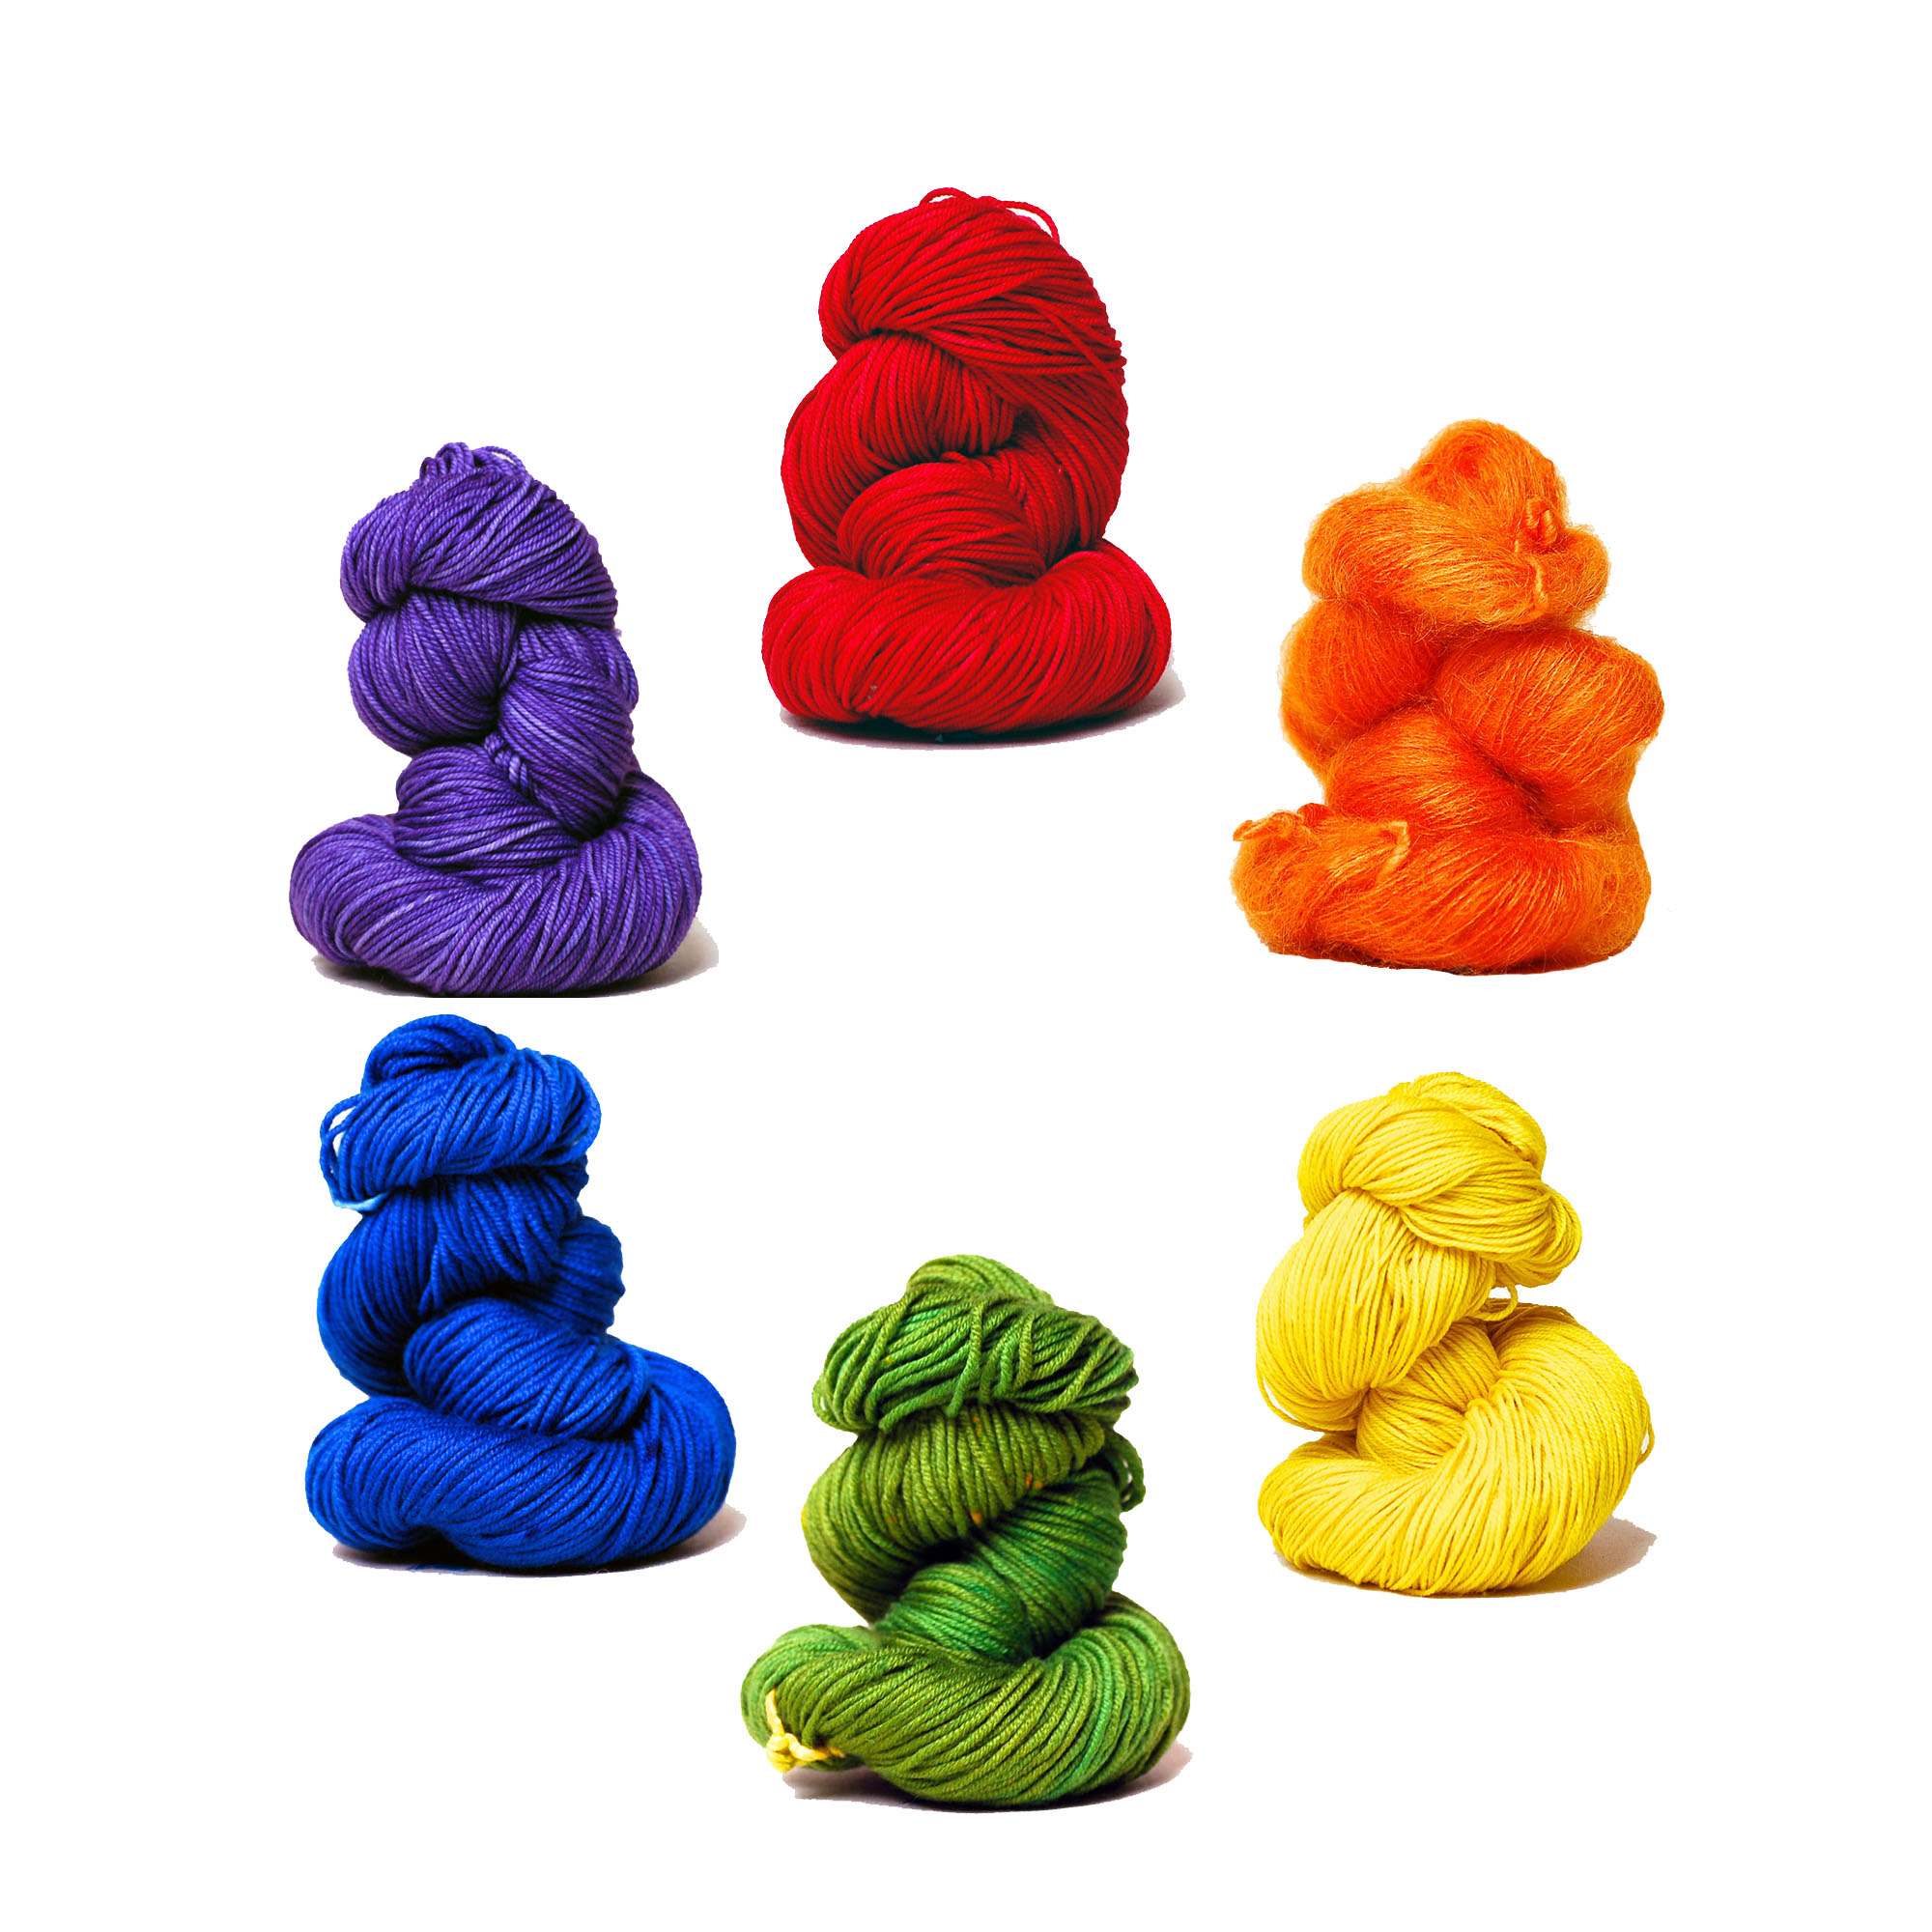 Energetic Colors school of color